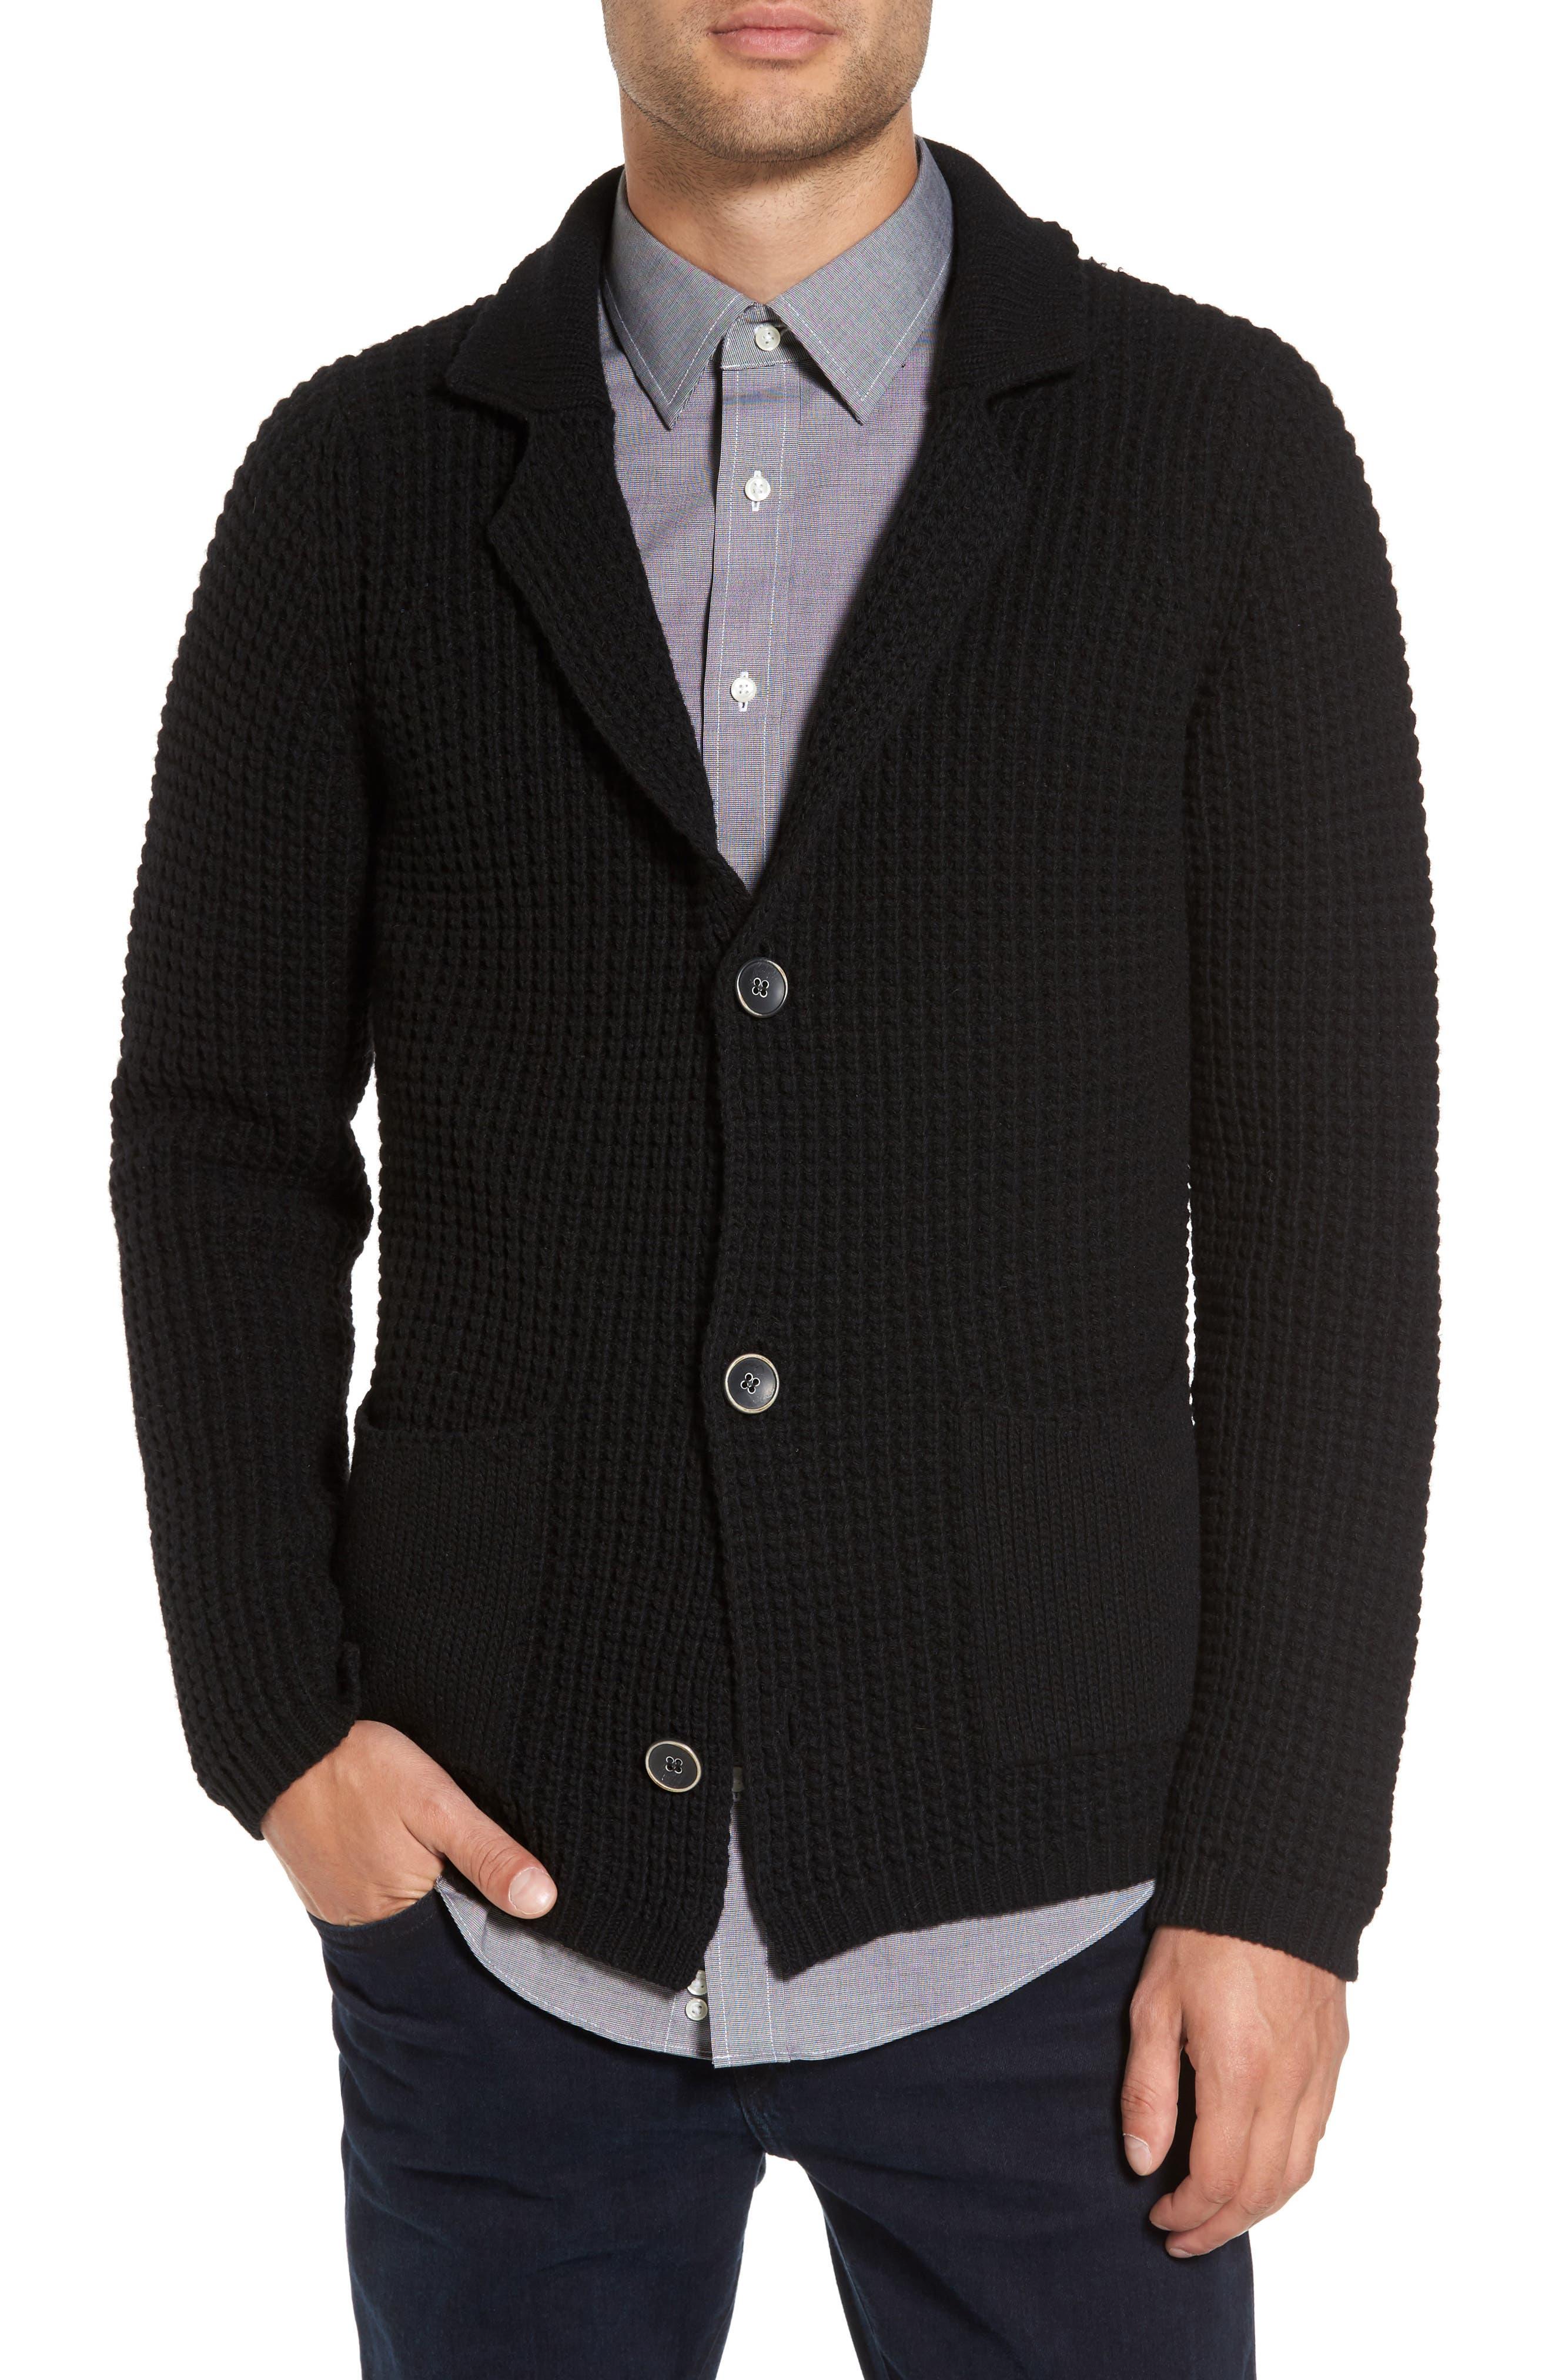 Trim Fit Knit Cardigan Jacket,                             Main thumbnail 1, color,                             001